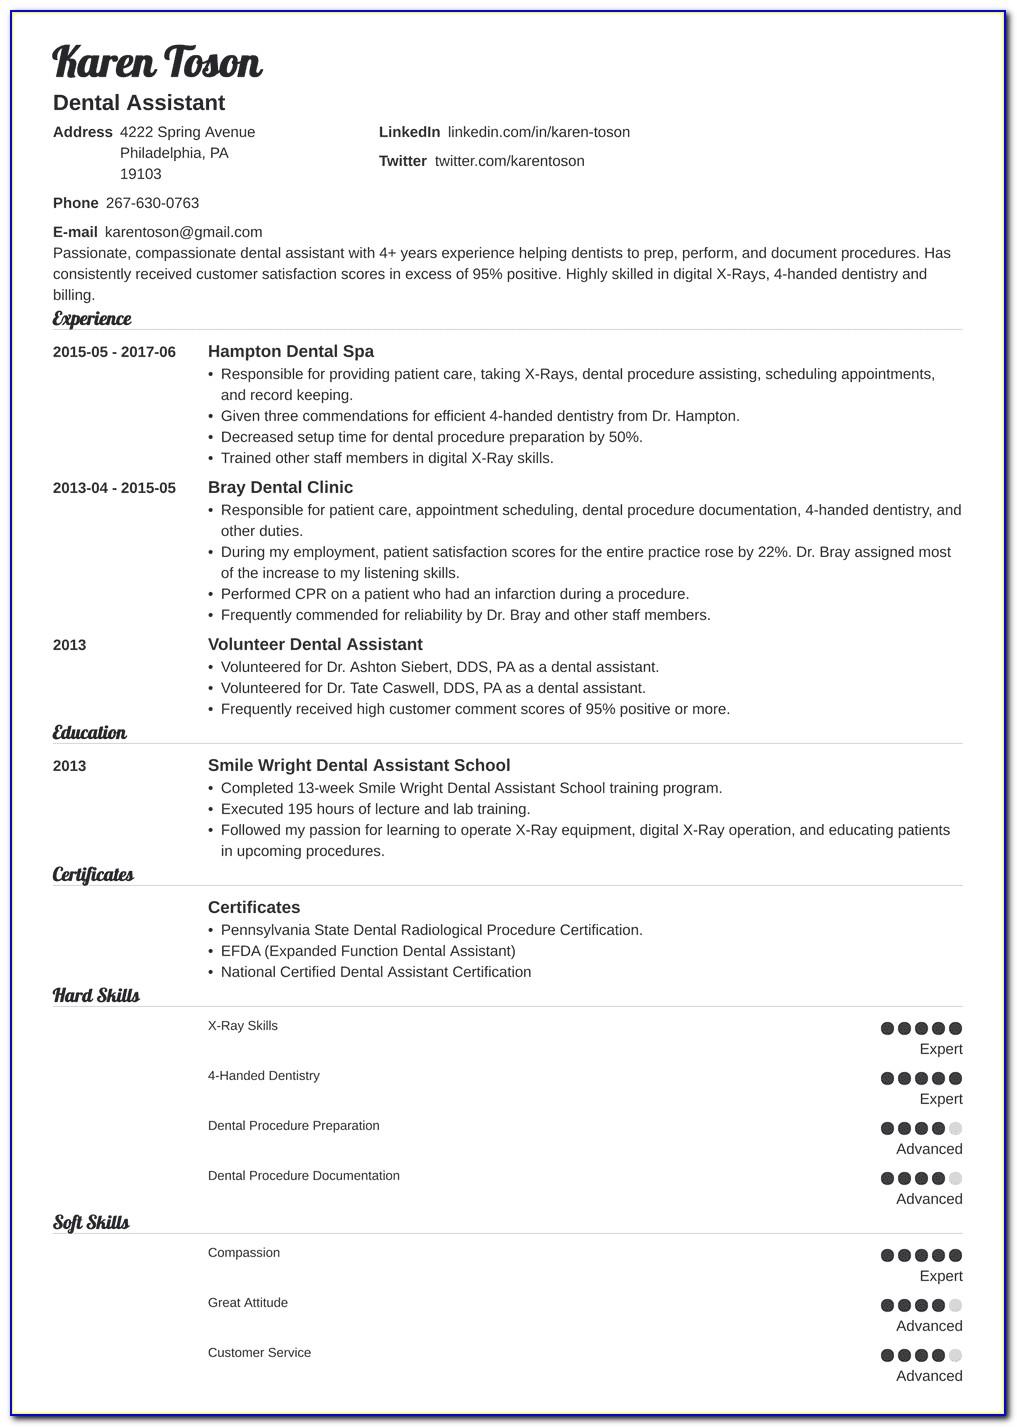 Dental Assistant Resume Sample Cover Letter